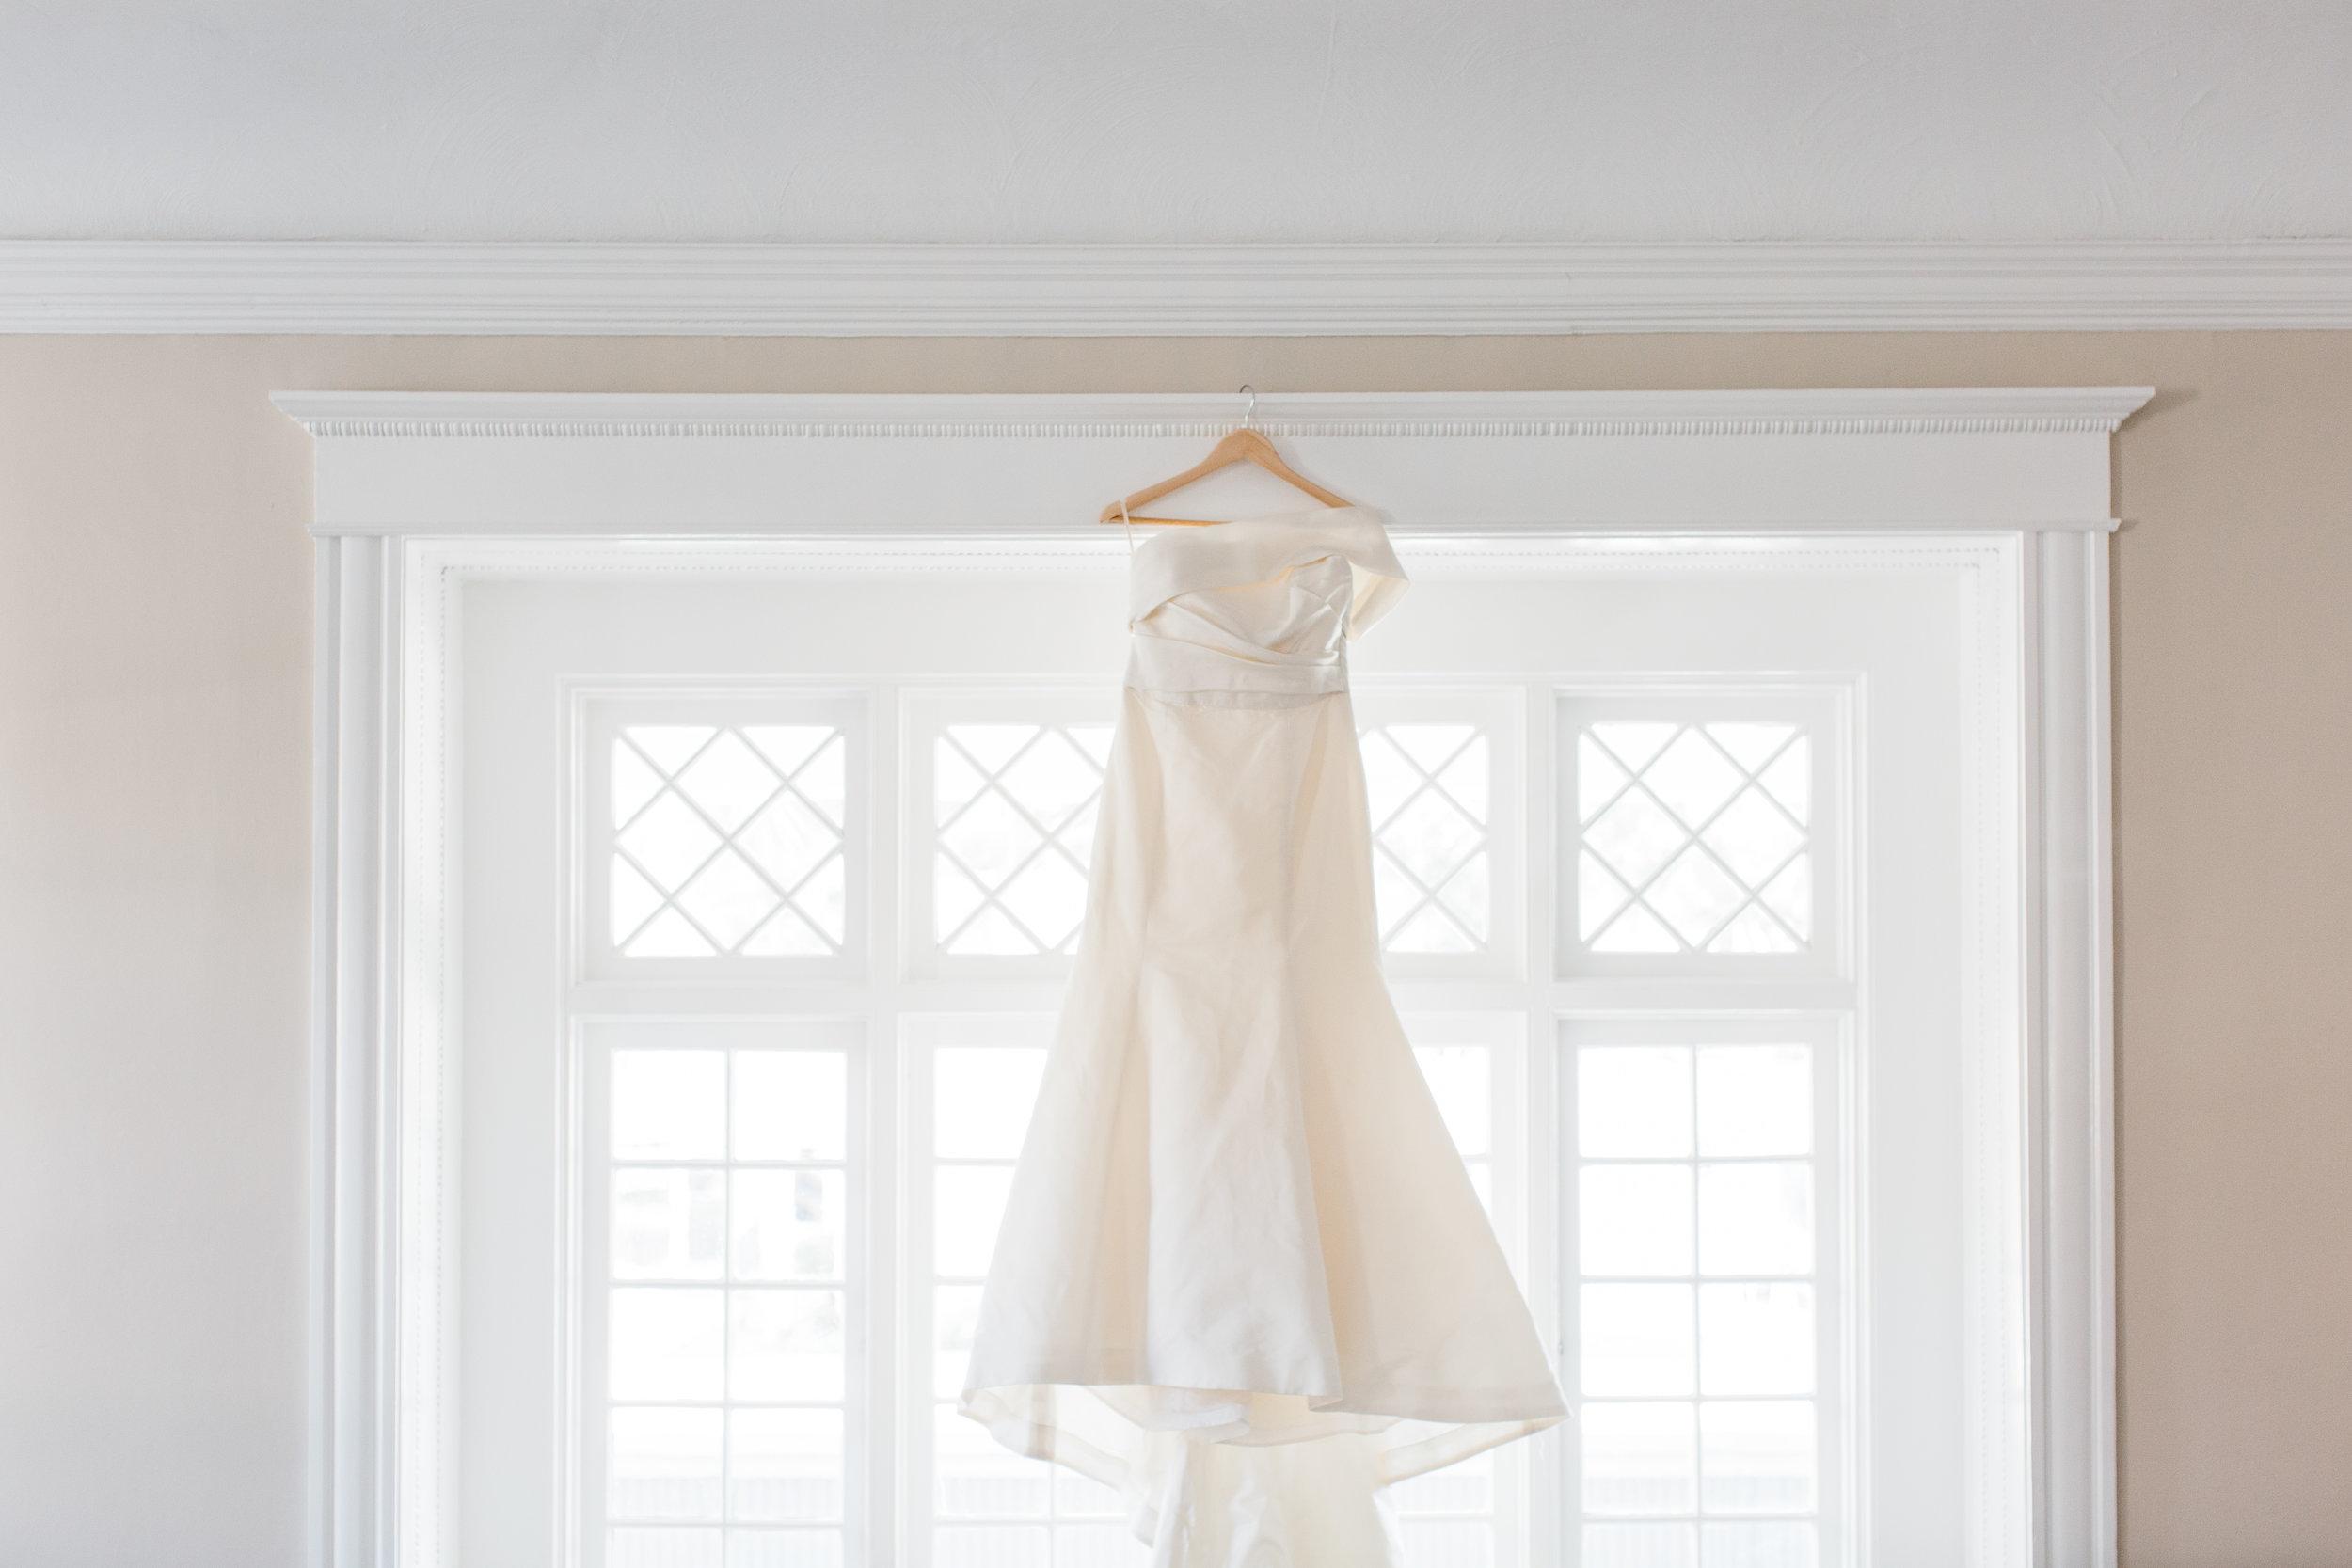 amsale wedding dress hanging